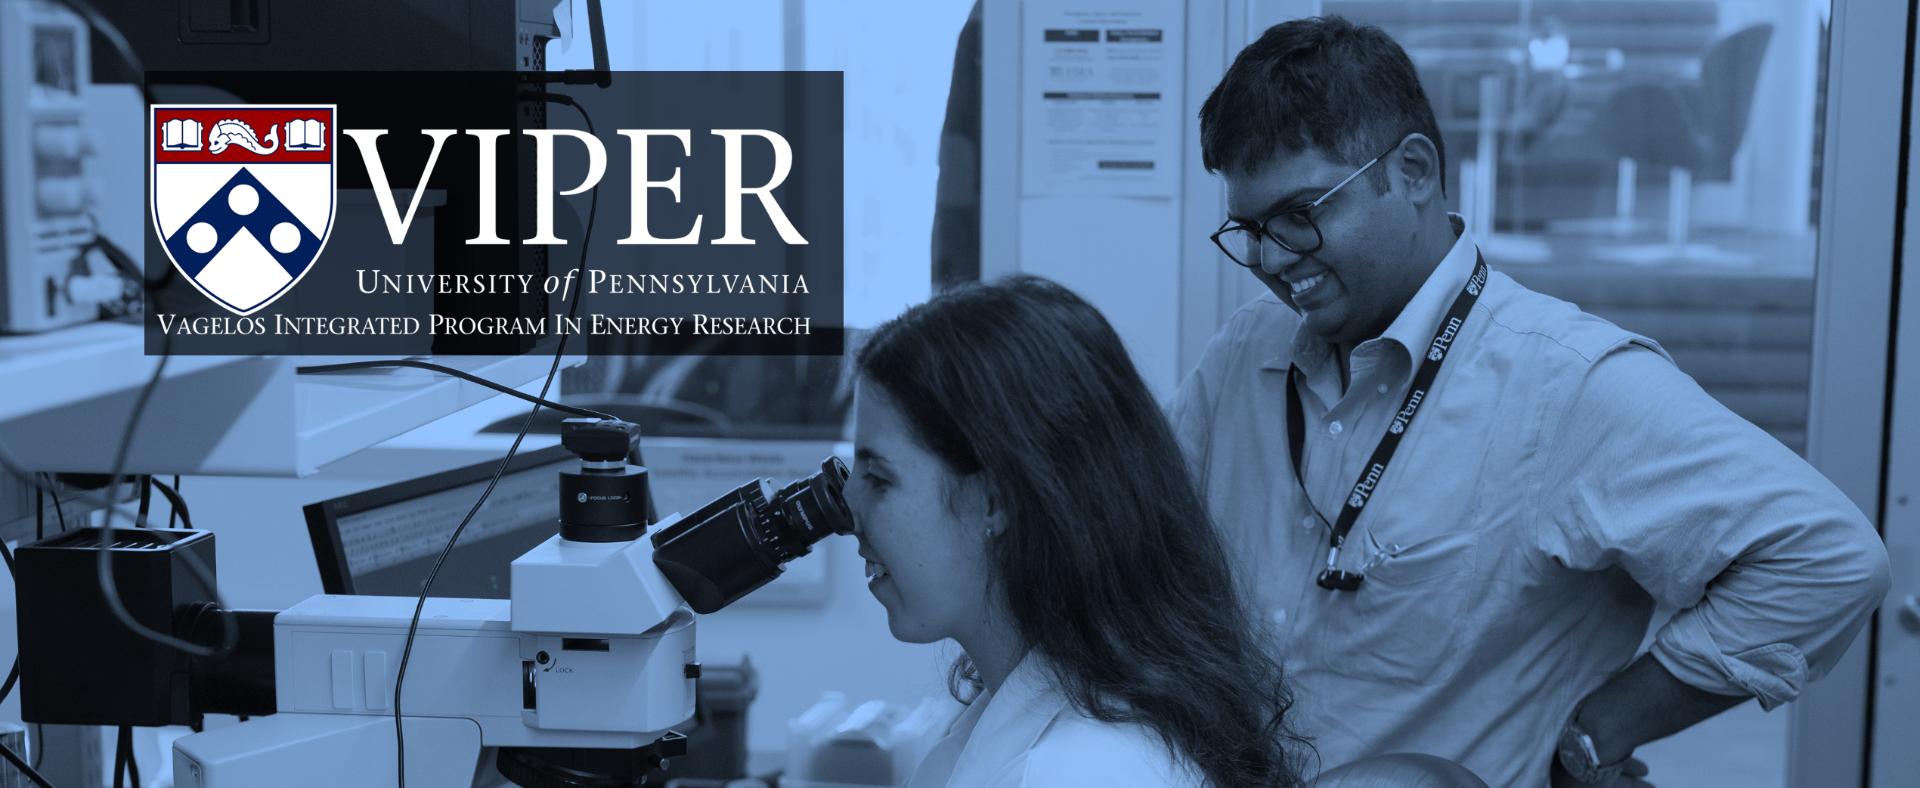 Visit the VIPER Website